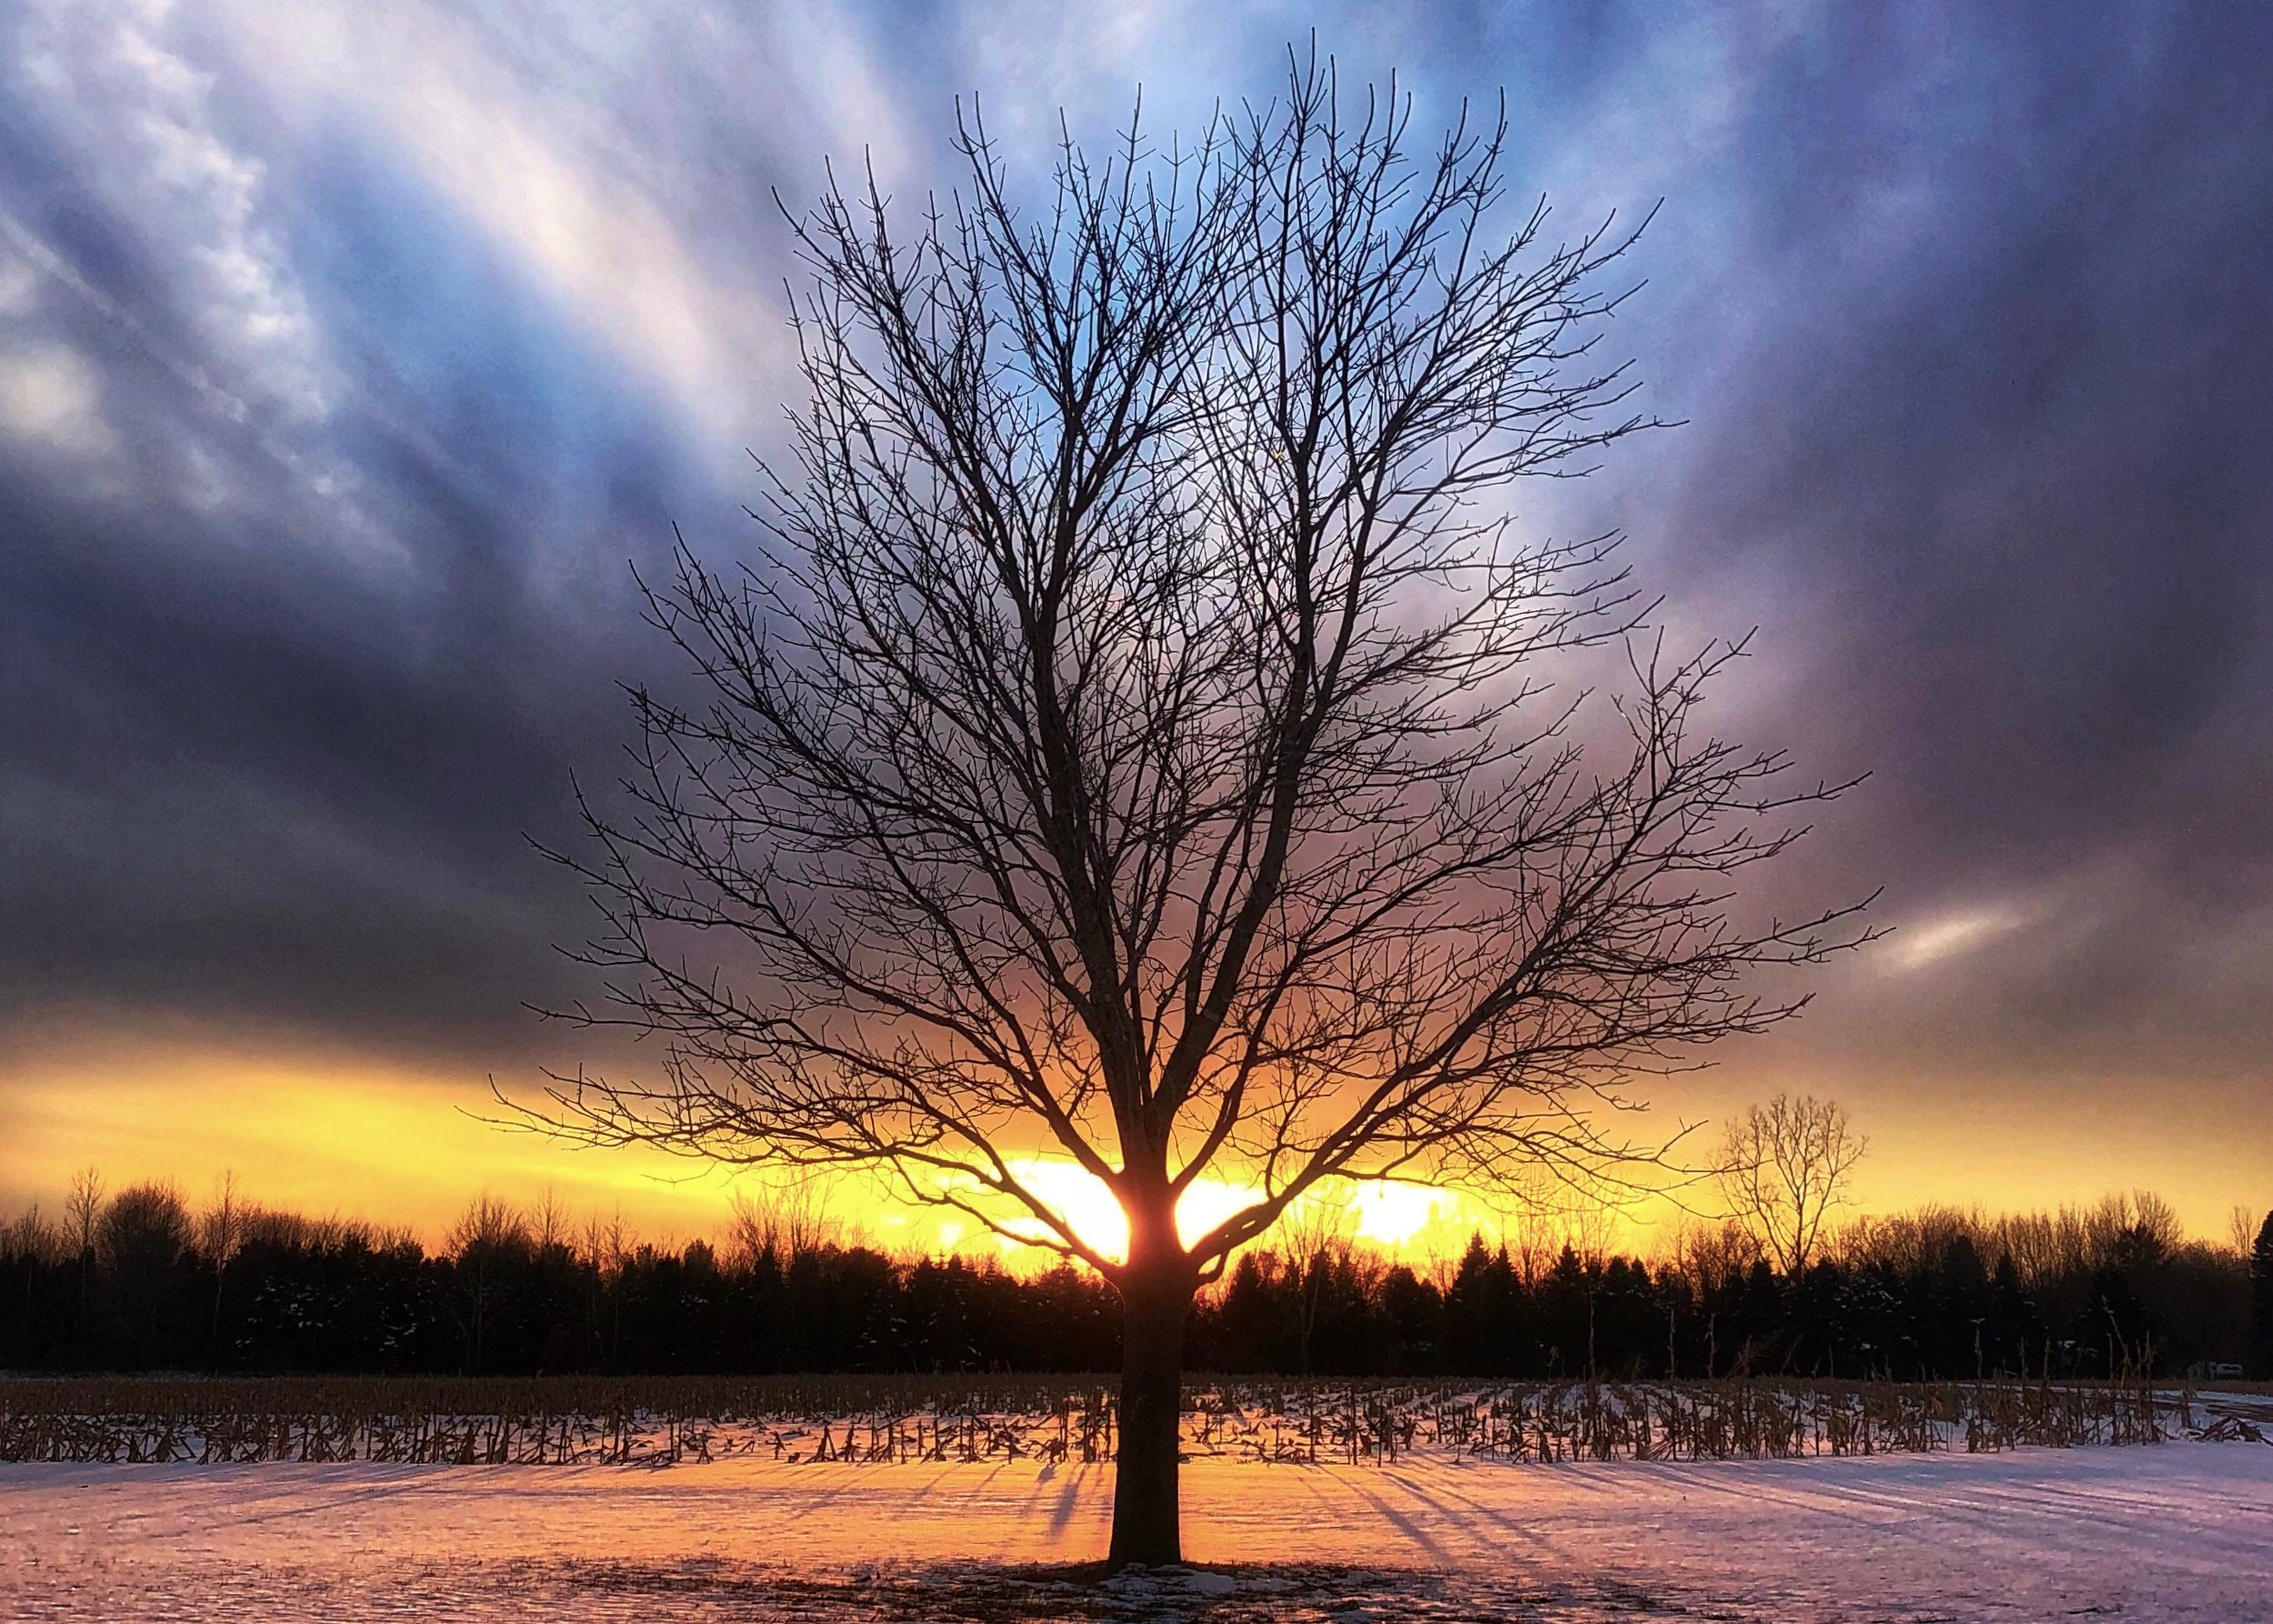 tree-sun-snow5x7.png